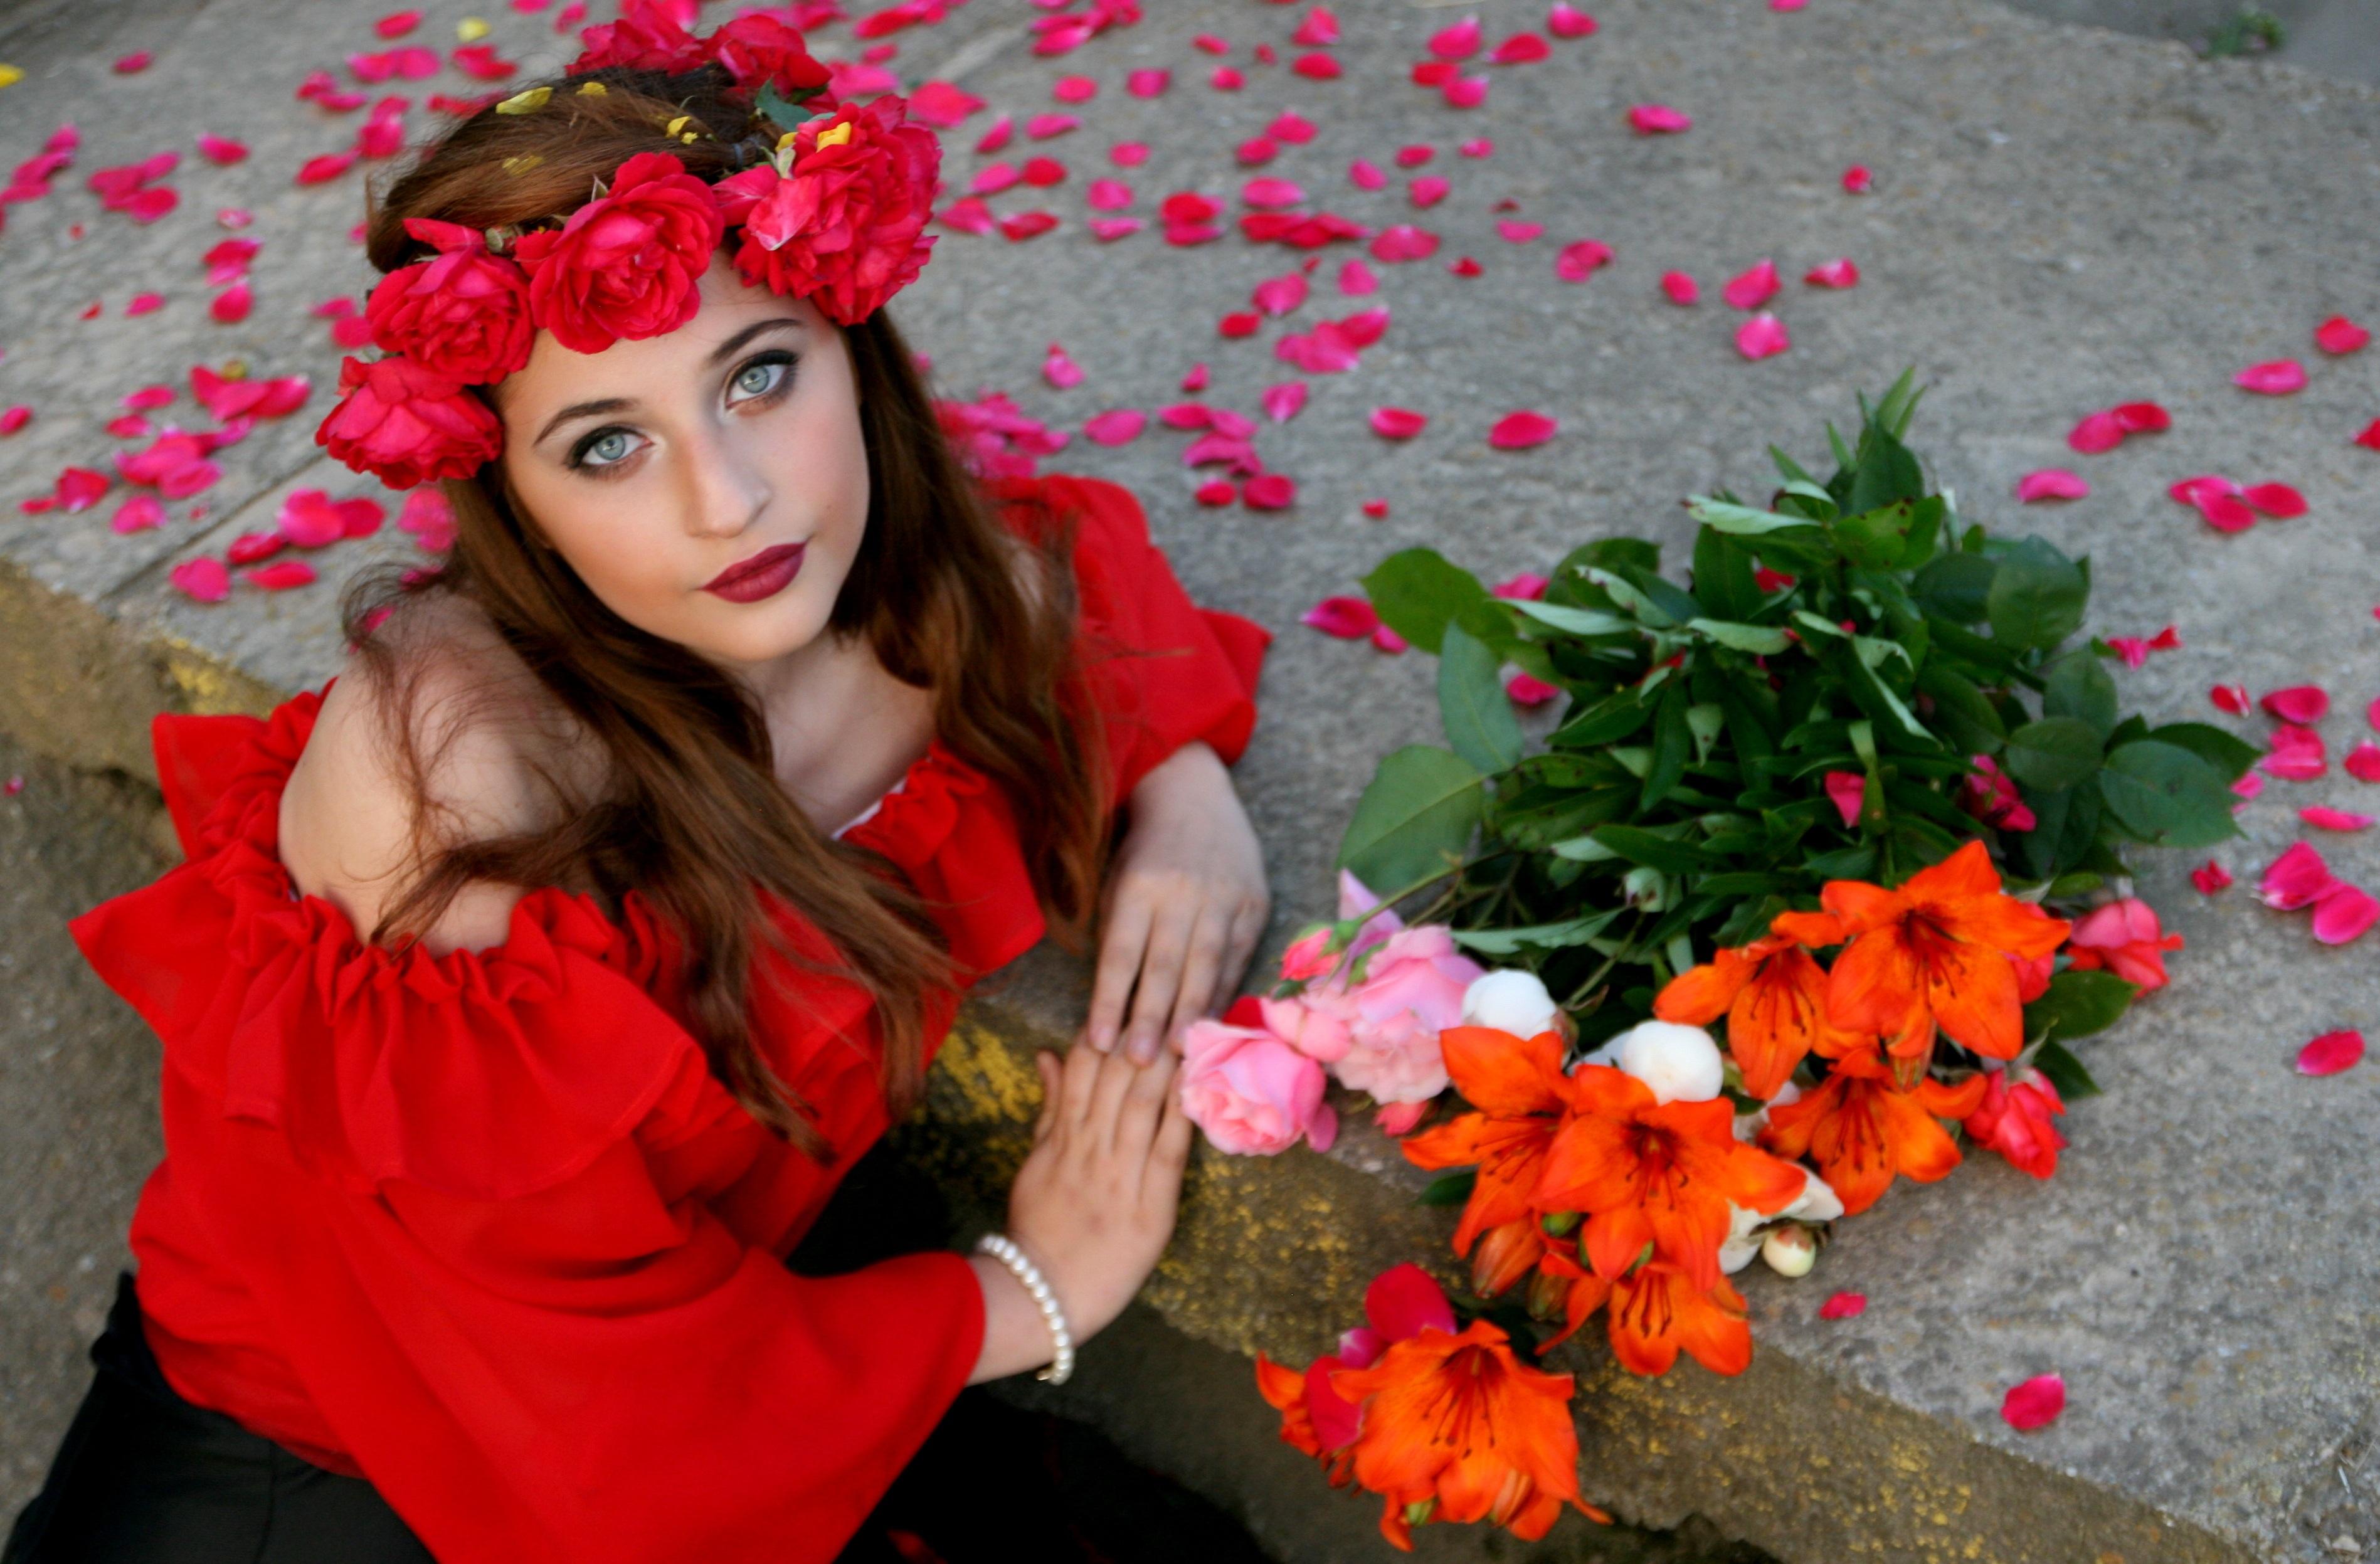 Картинки фото девушки с цветами